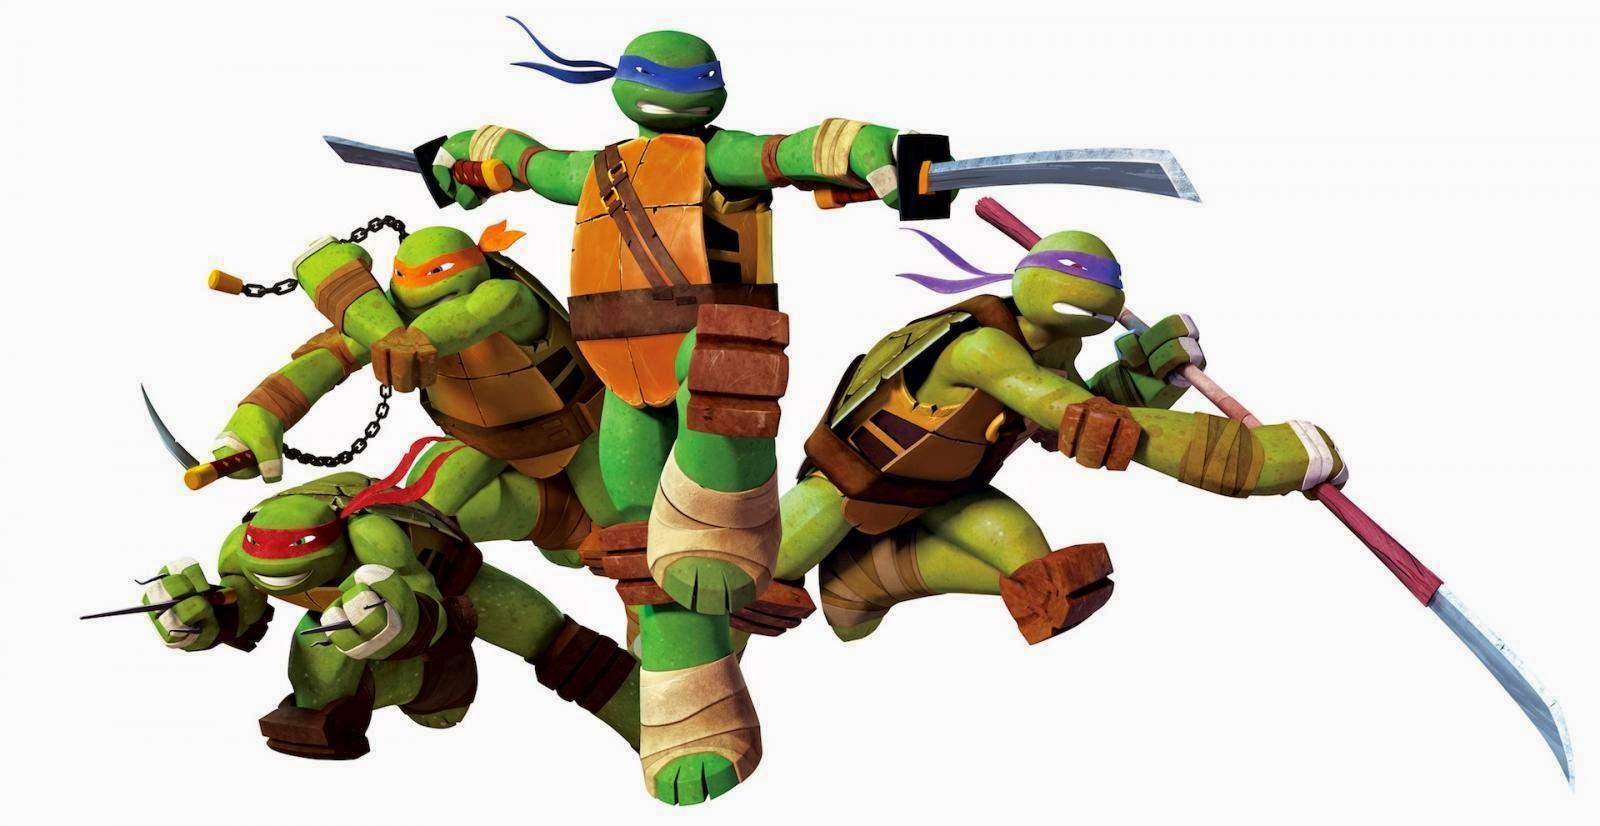 Teenage Mutant Ninja Turtles Backgrounds, Compatible - PC, Mobile, Gadgets| 1600x826 px